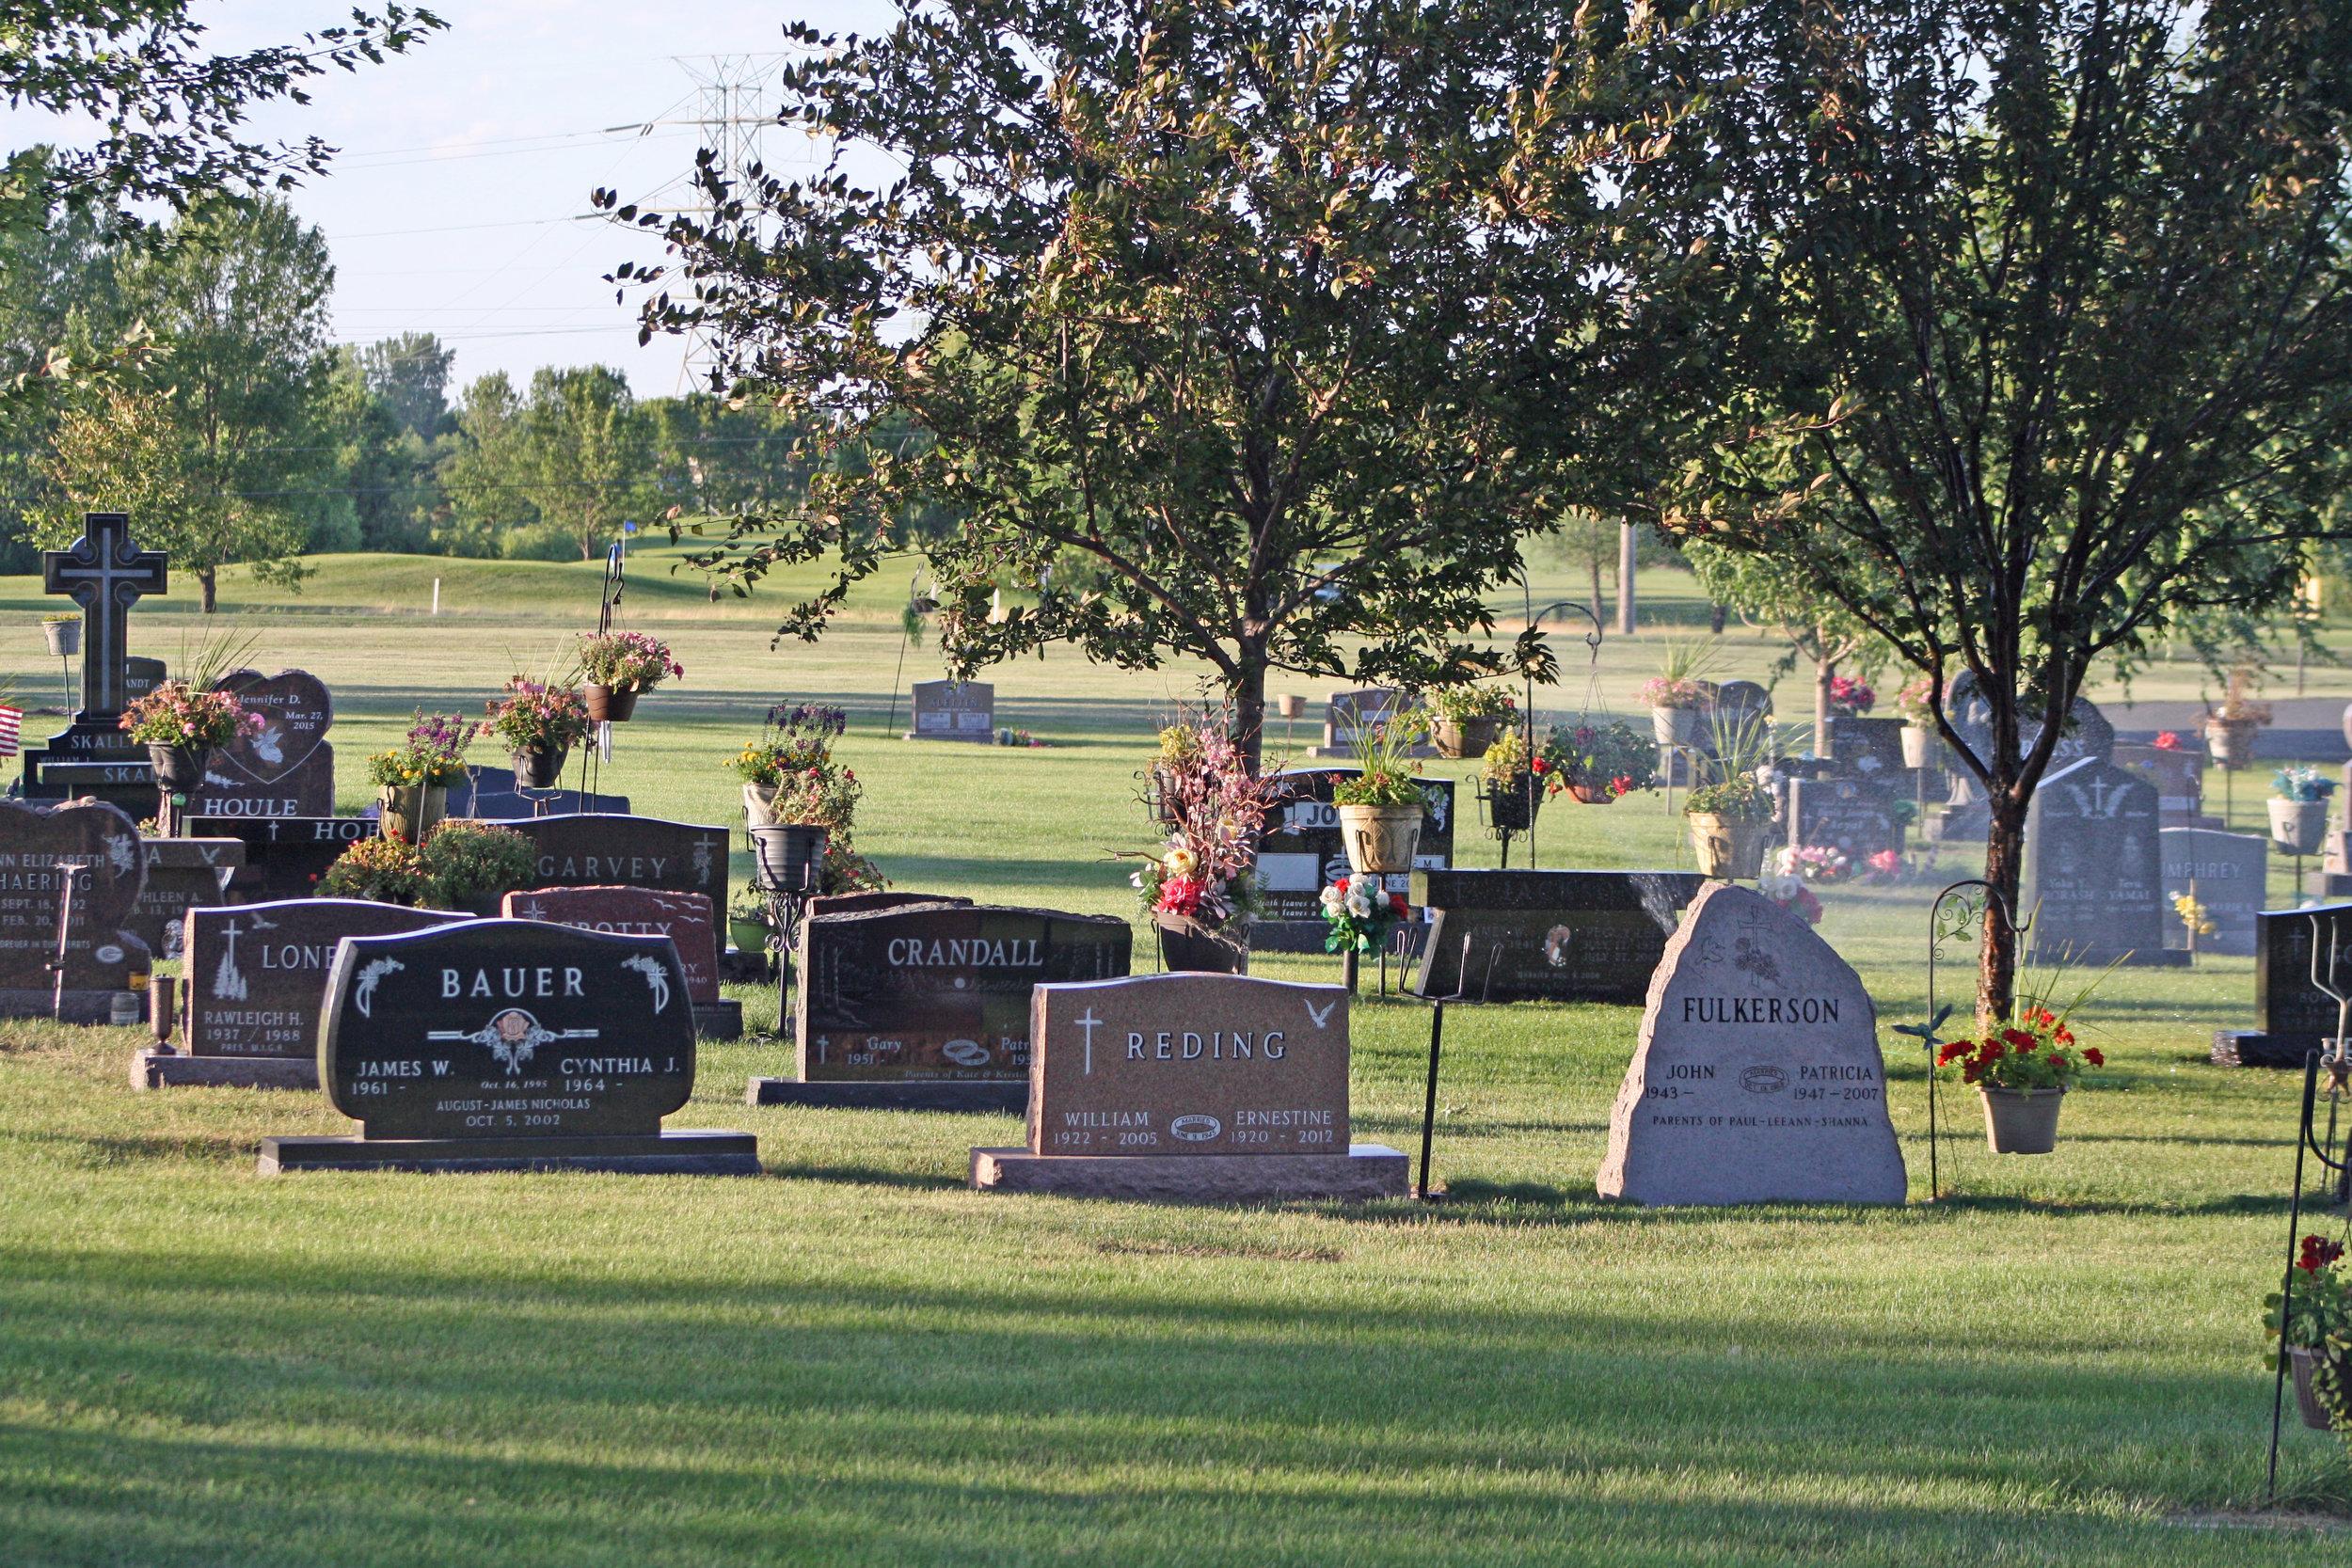 Gravestones in a cemetery in the sunlight